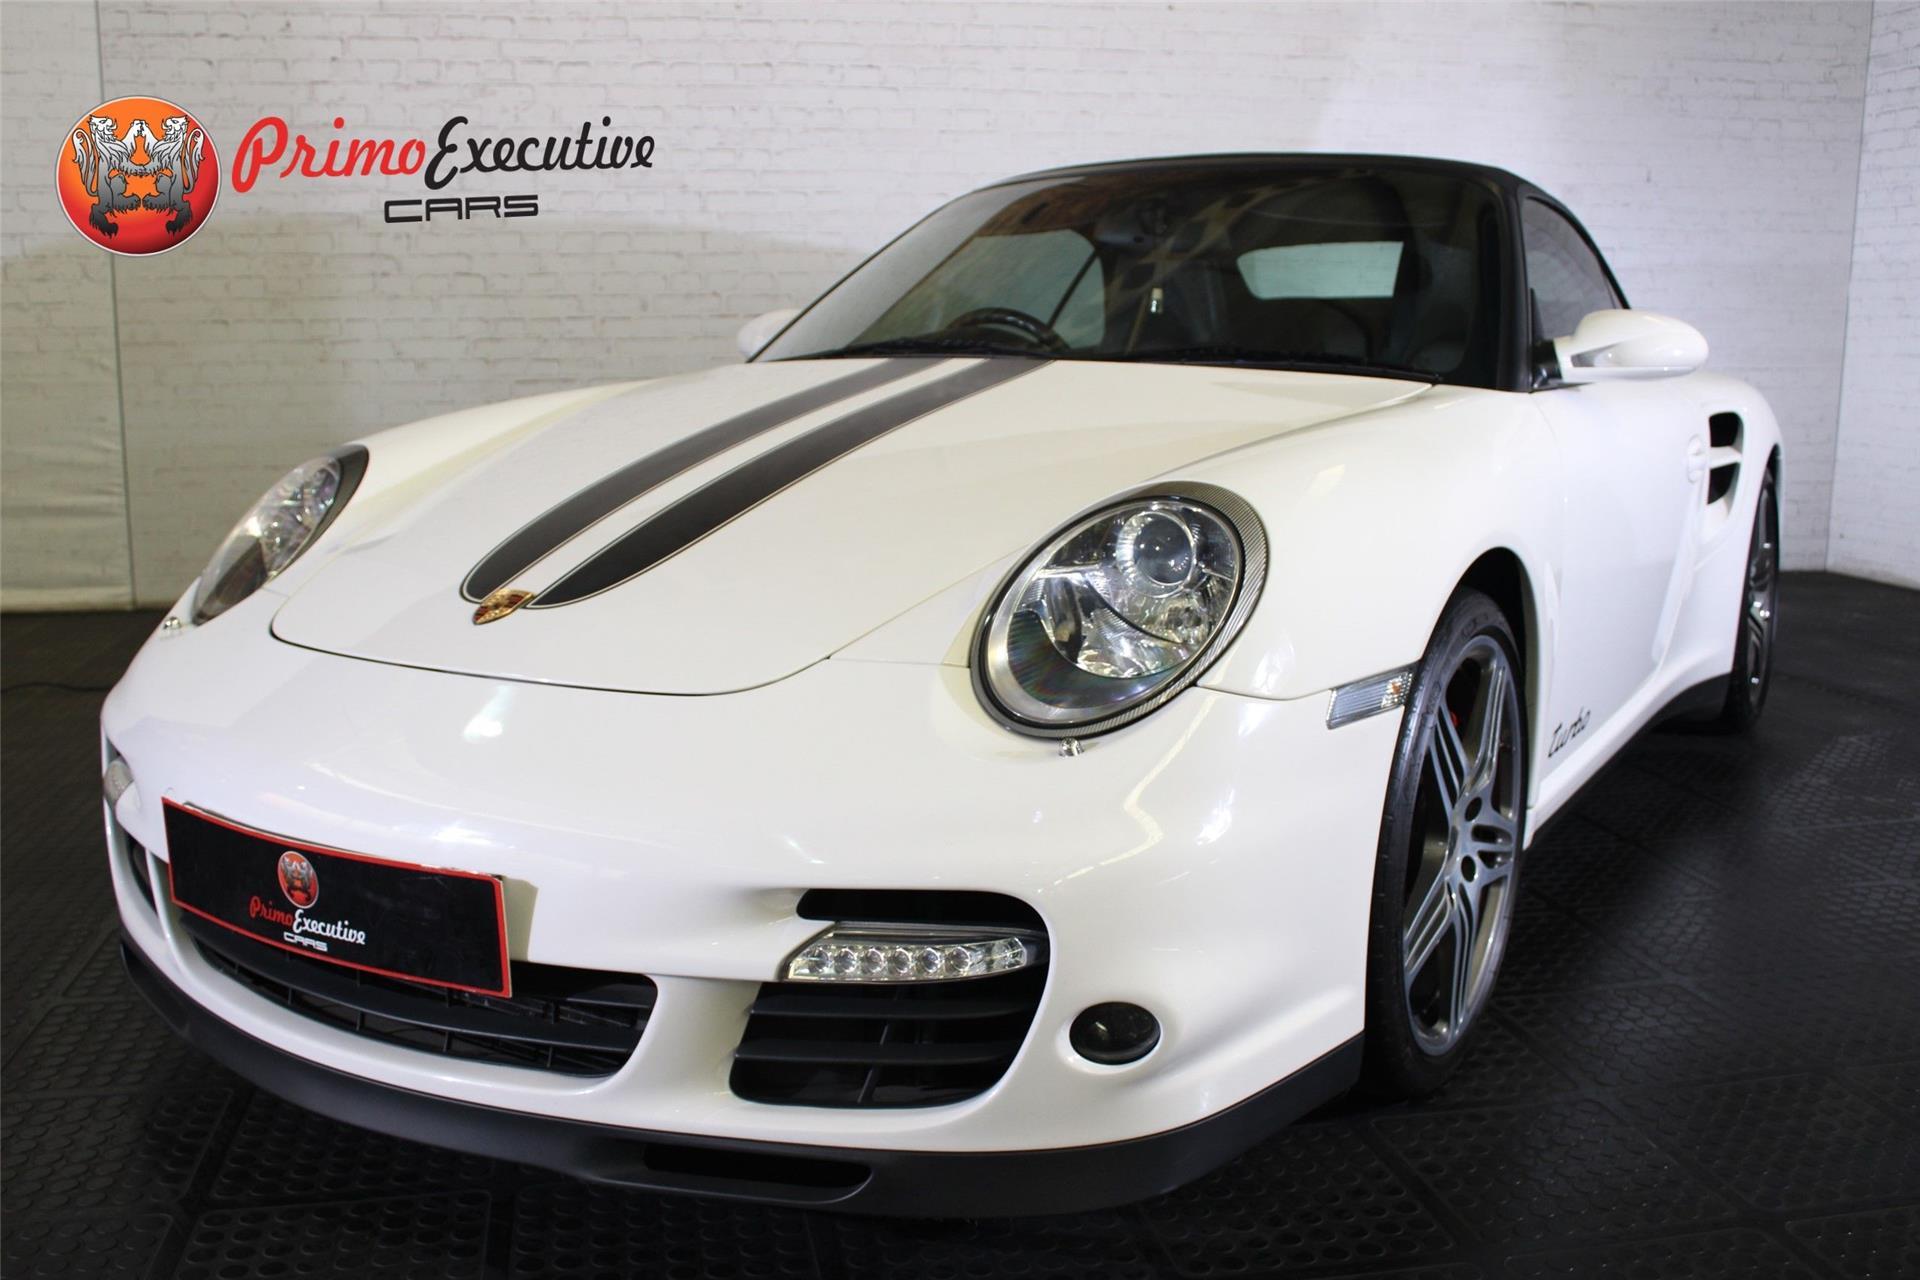 Porsche 911 Turbo Cabriolet Tiptronic